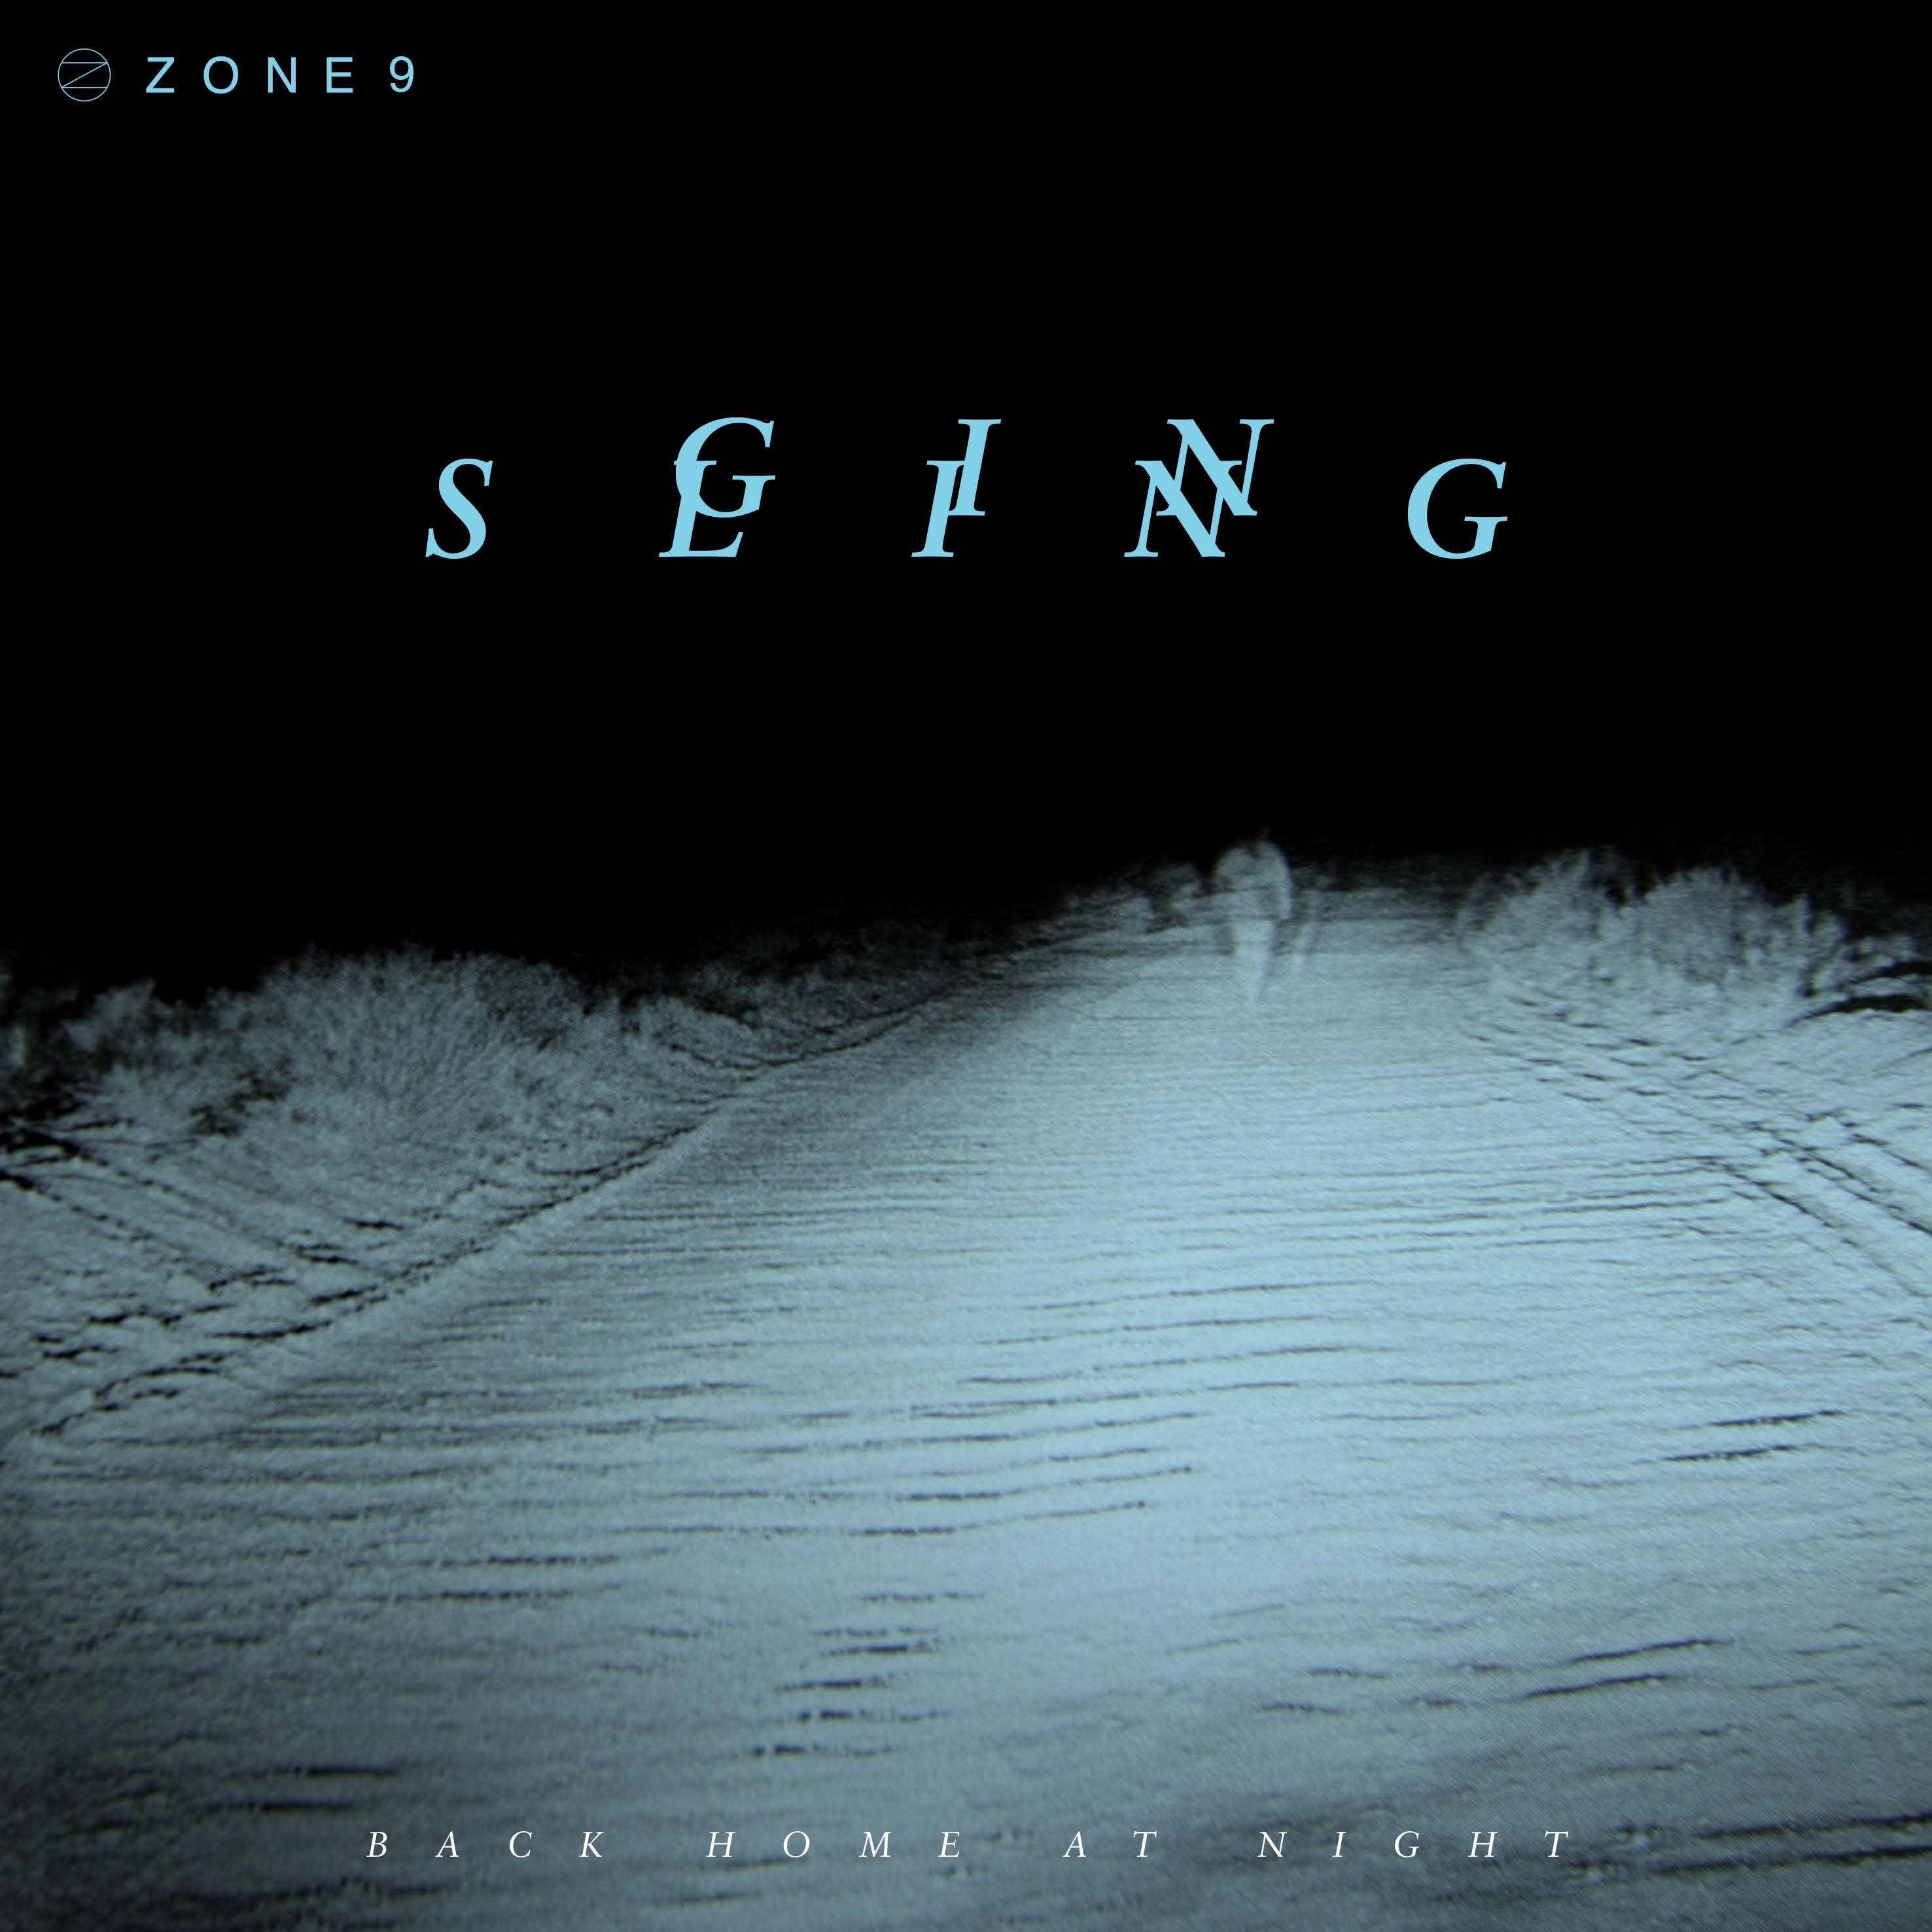 ZONE 9 - Gin Sling